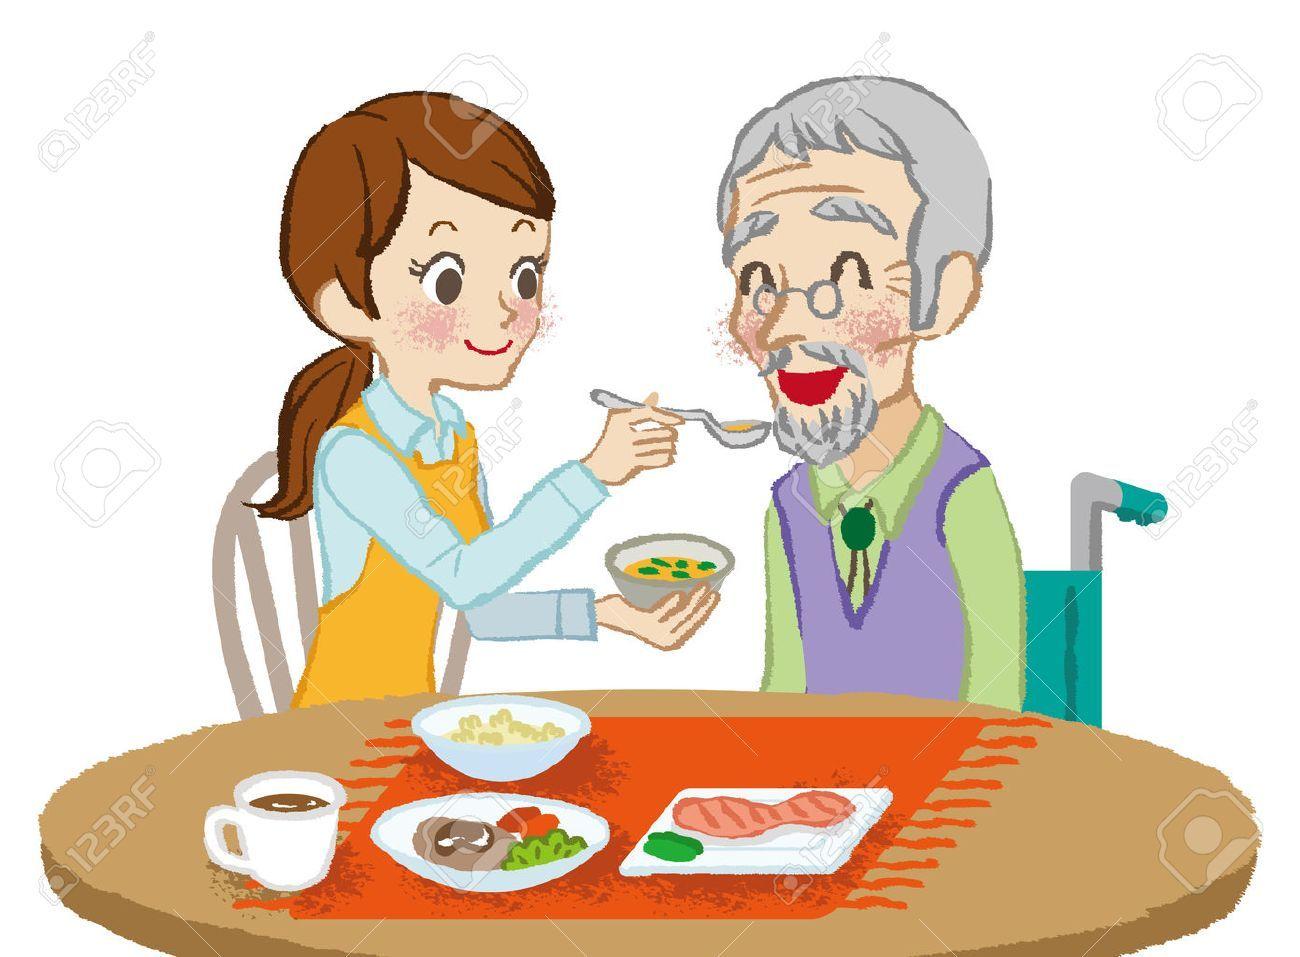 Elderly care clipart » Clipart Portal.